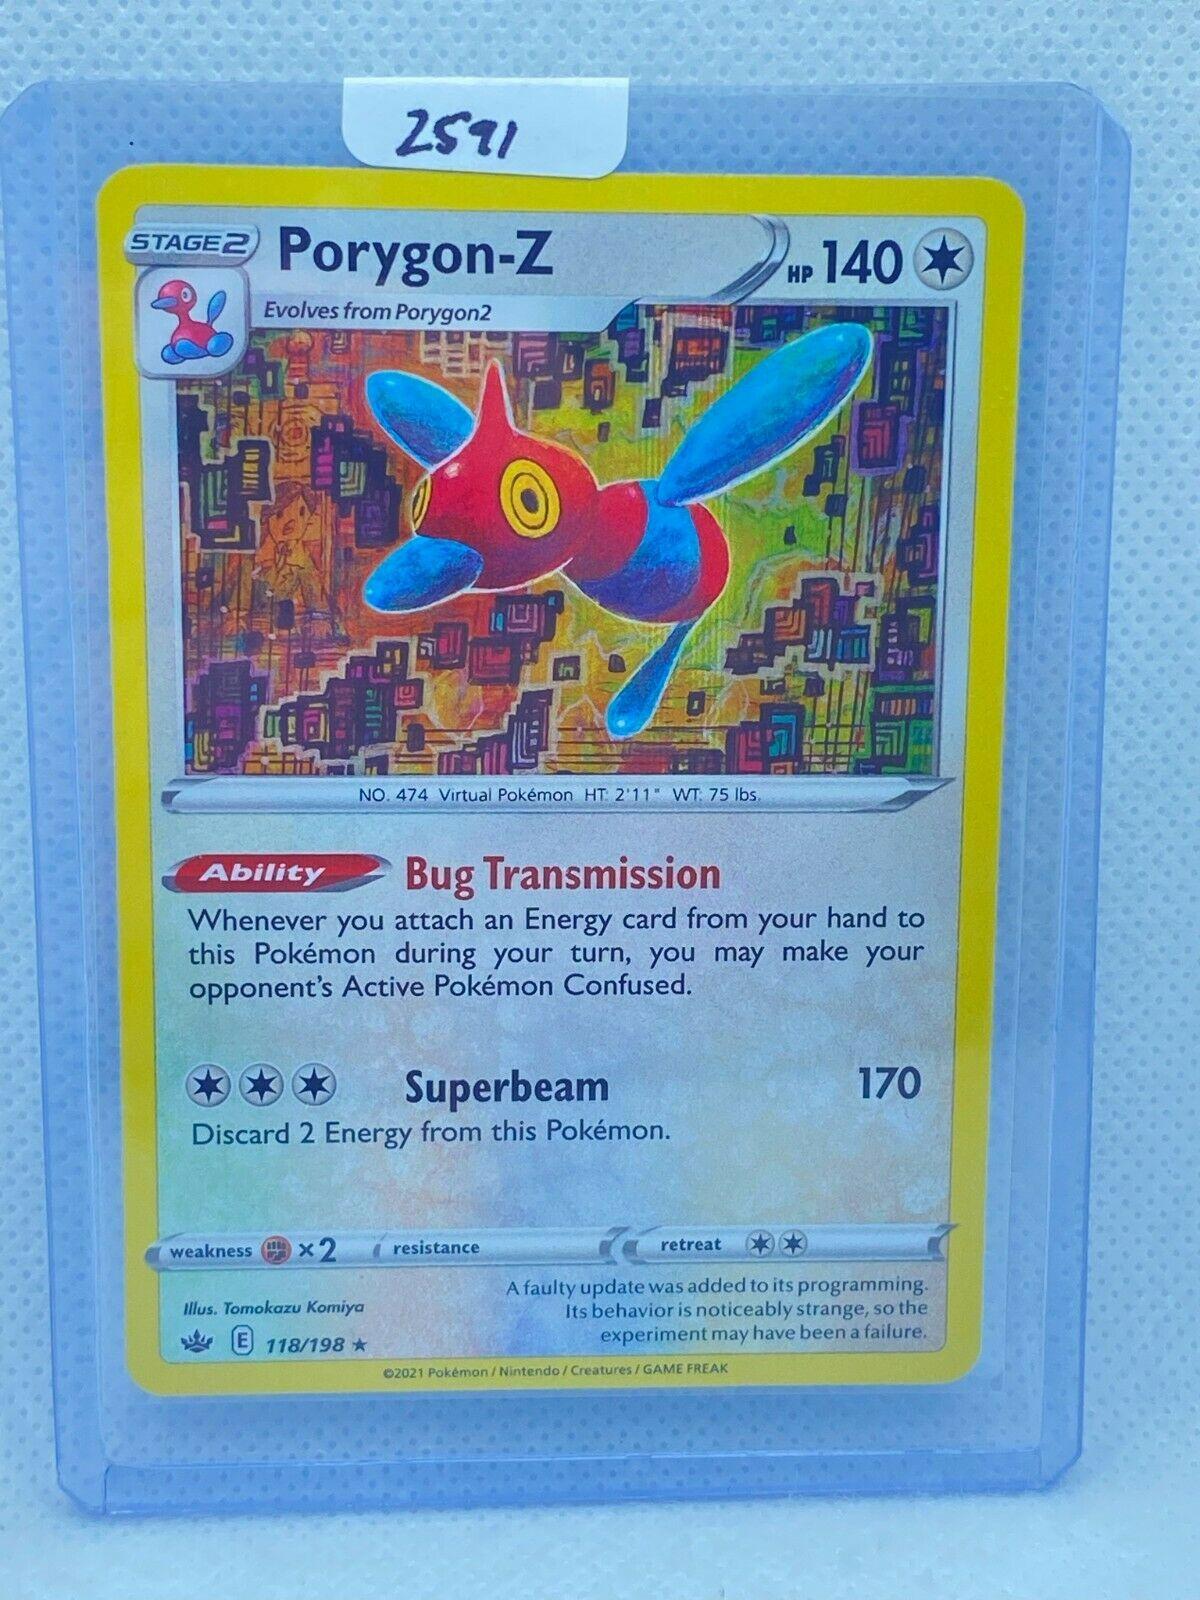 Pokémon TCG Porygon-Z Holo 118/198   Chilling Reign   Play/Grade Ready